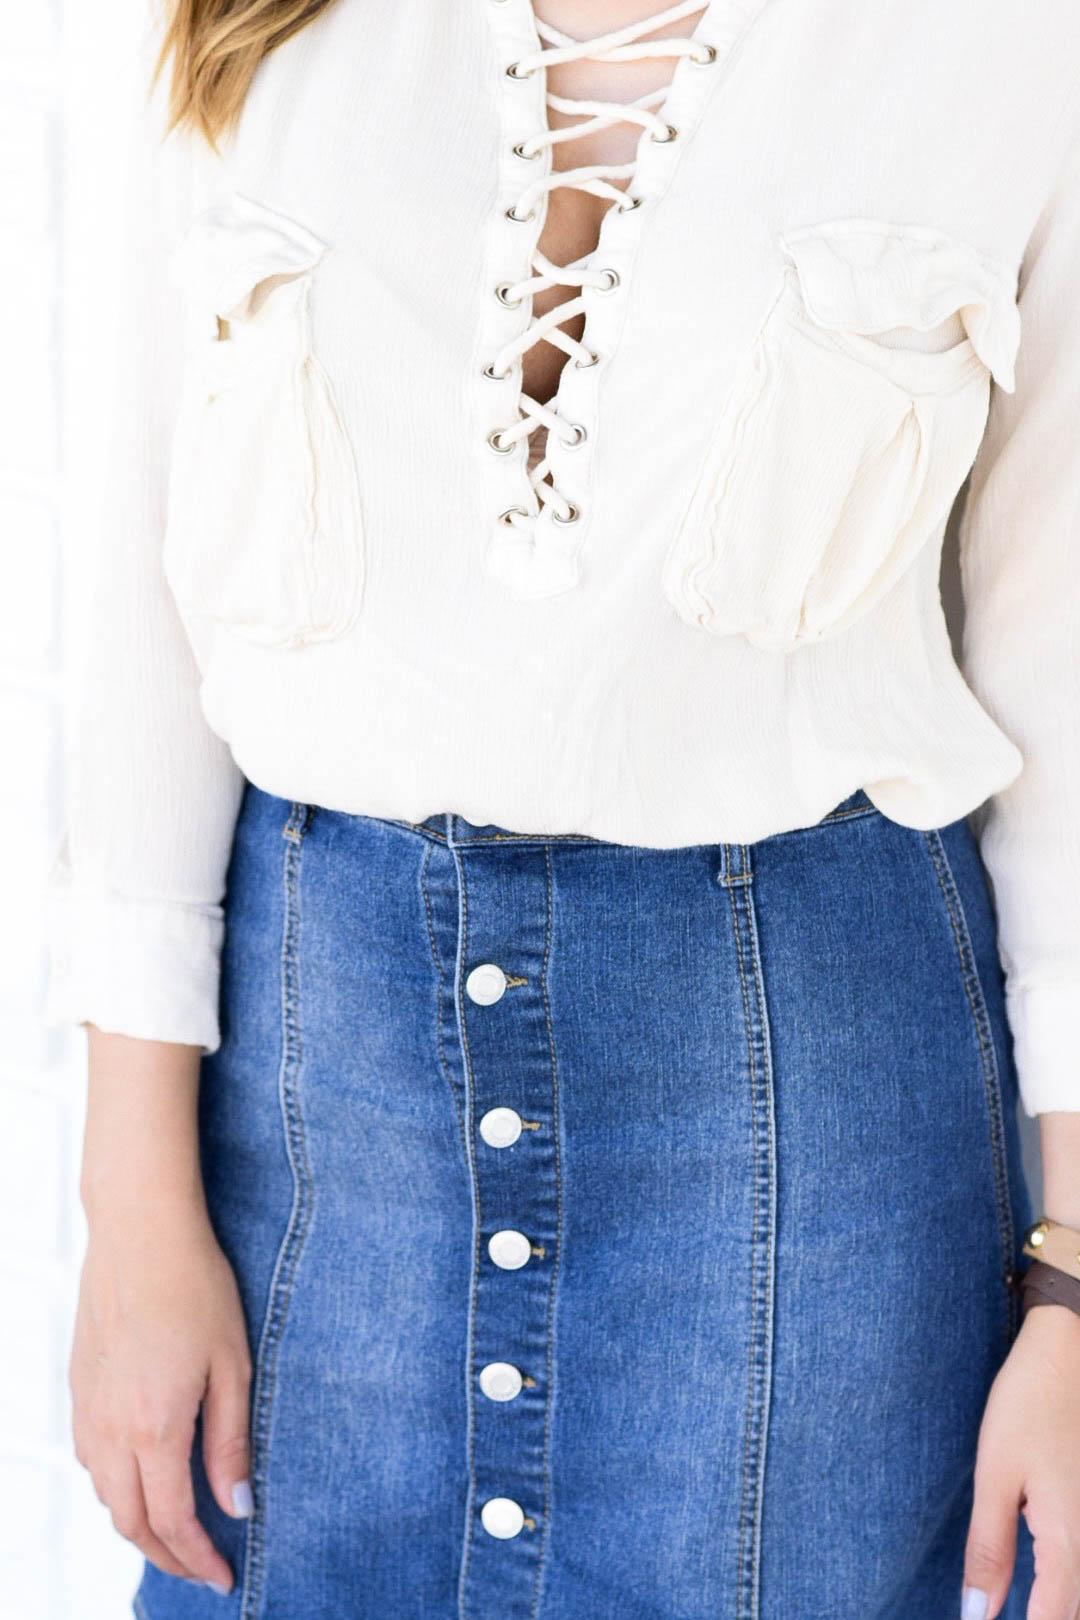 style the girl jean skirt5